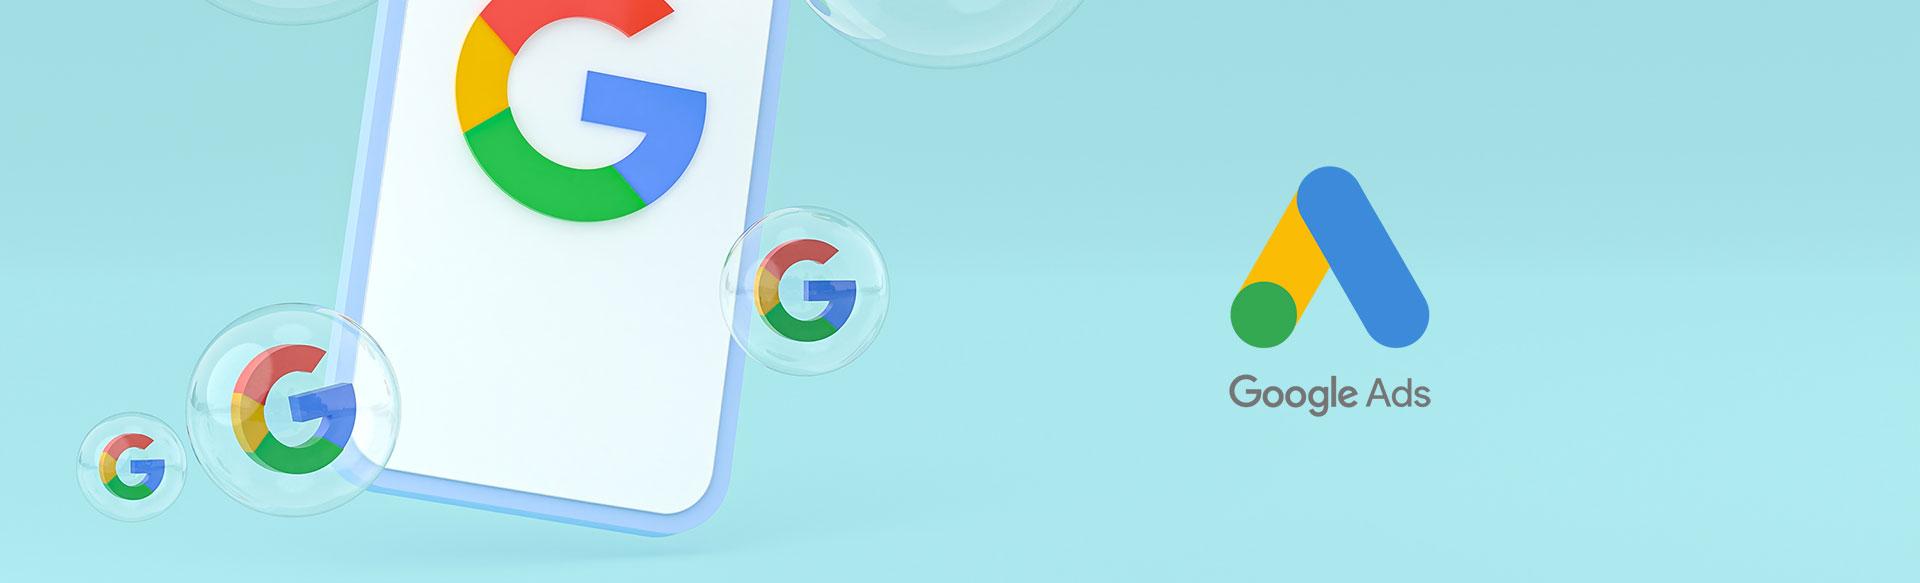 google ads koolitus cover